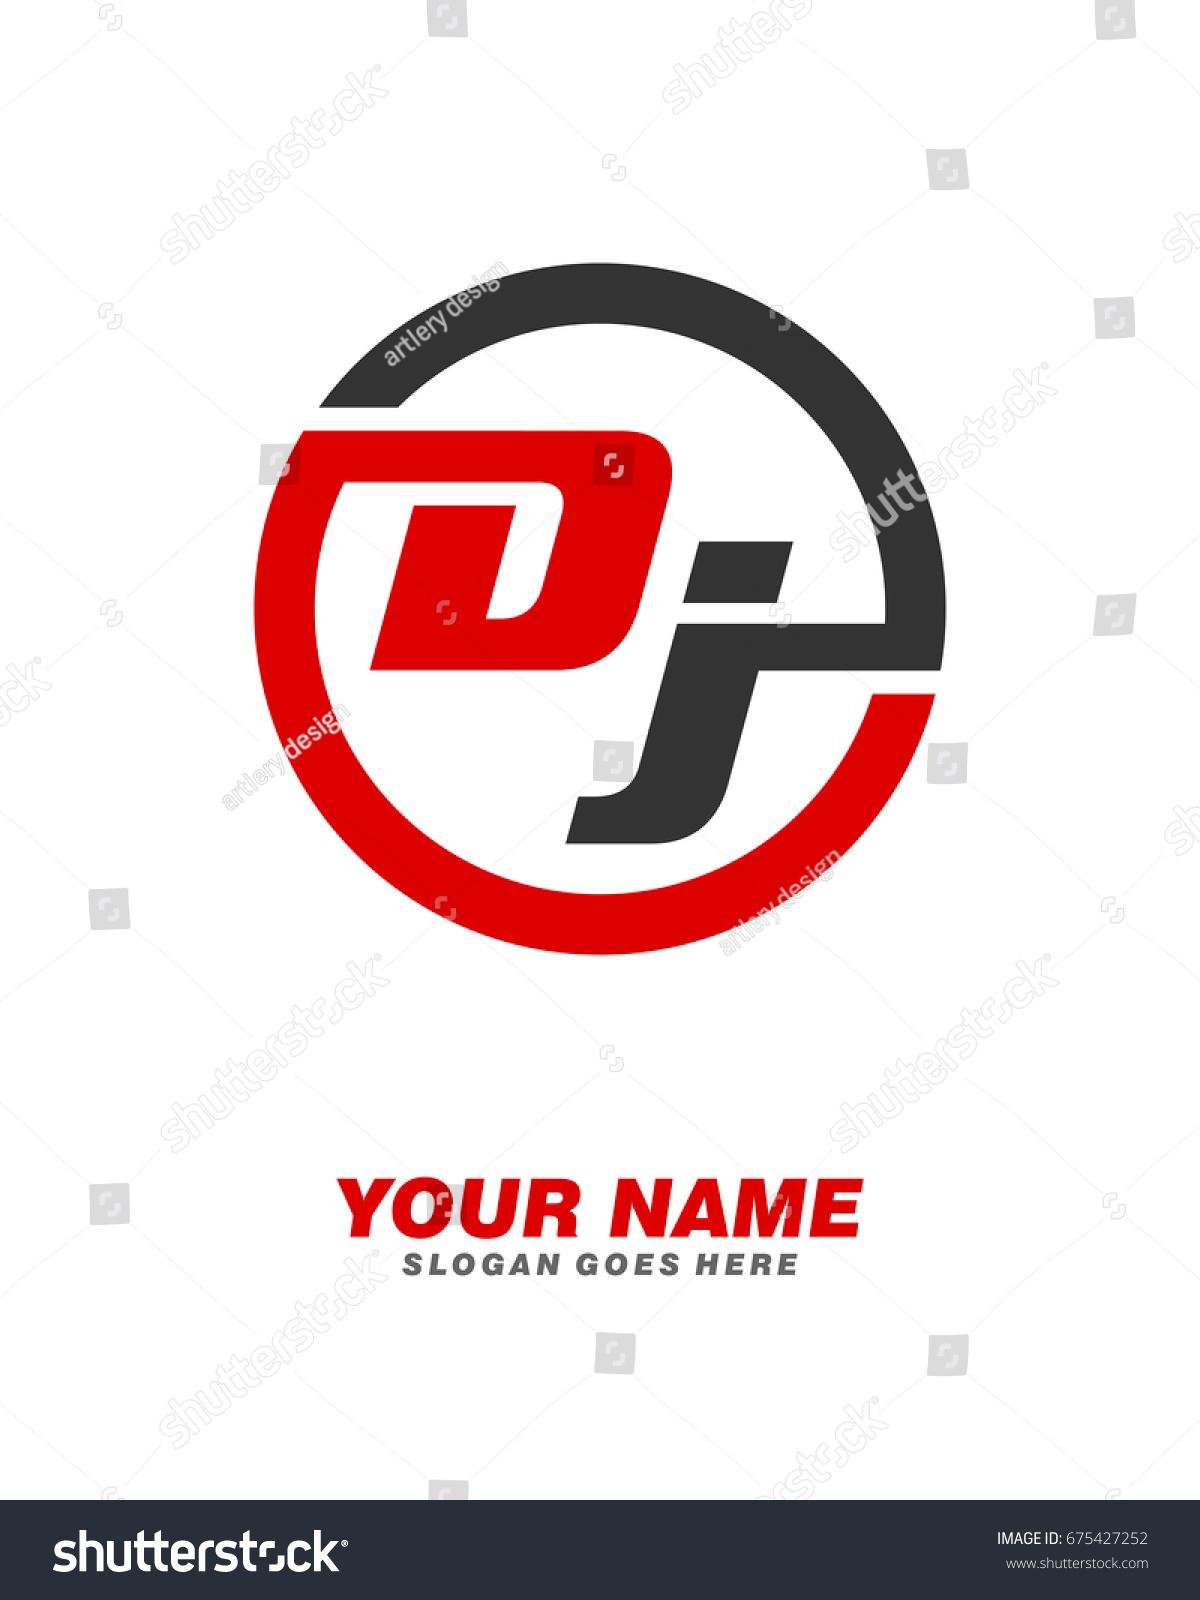 D J Initial Circle Logo Template Stock Vector (Royalty Free ...